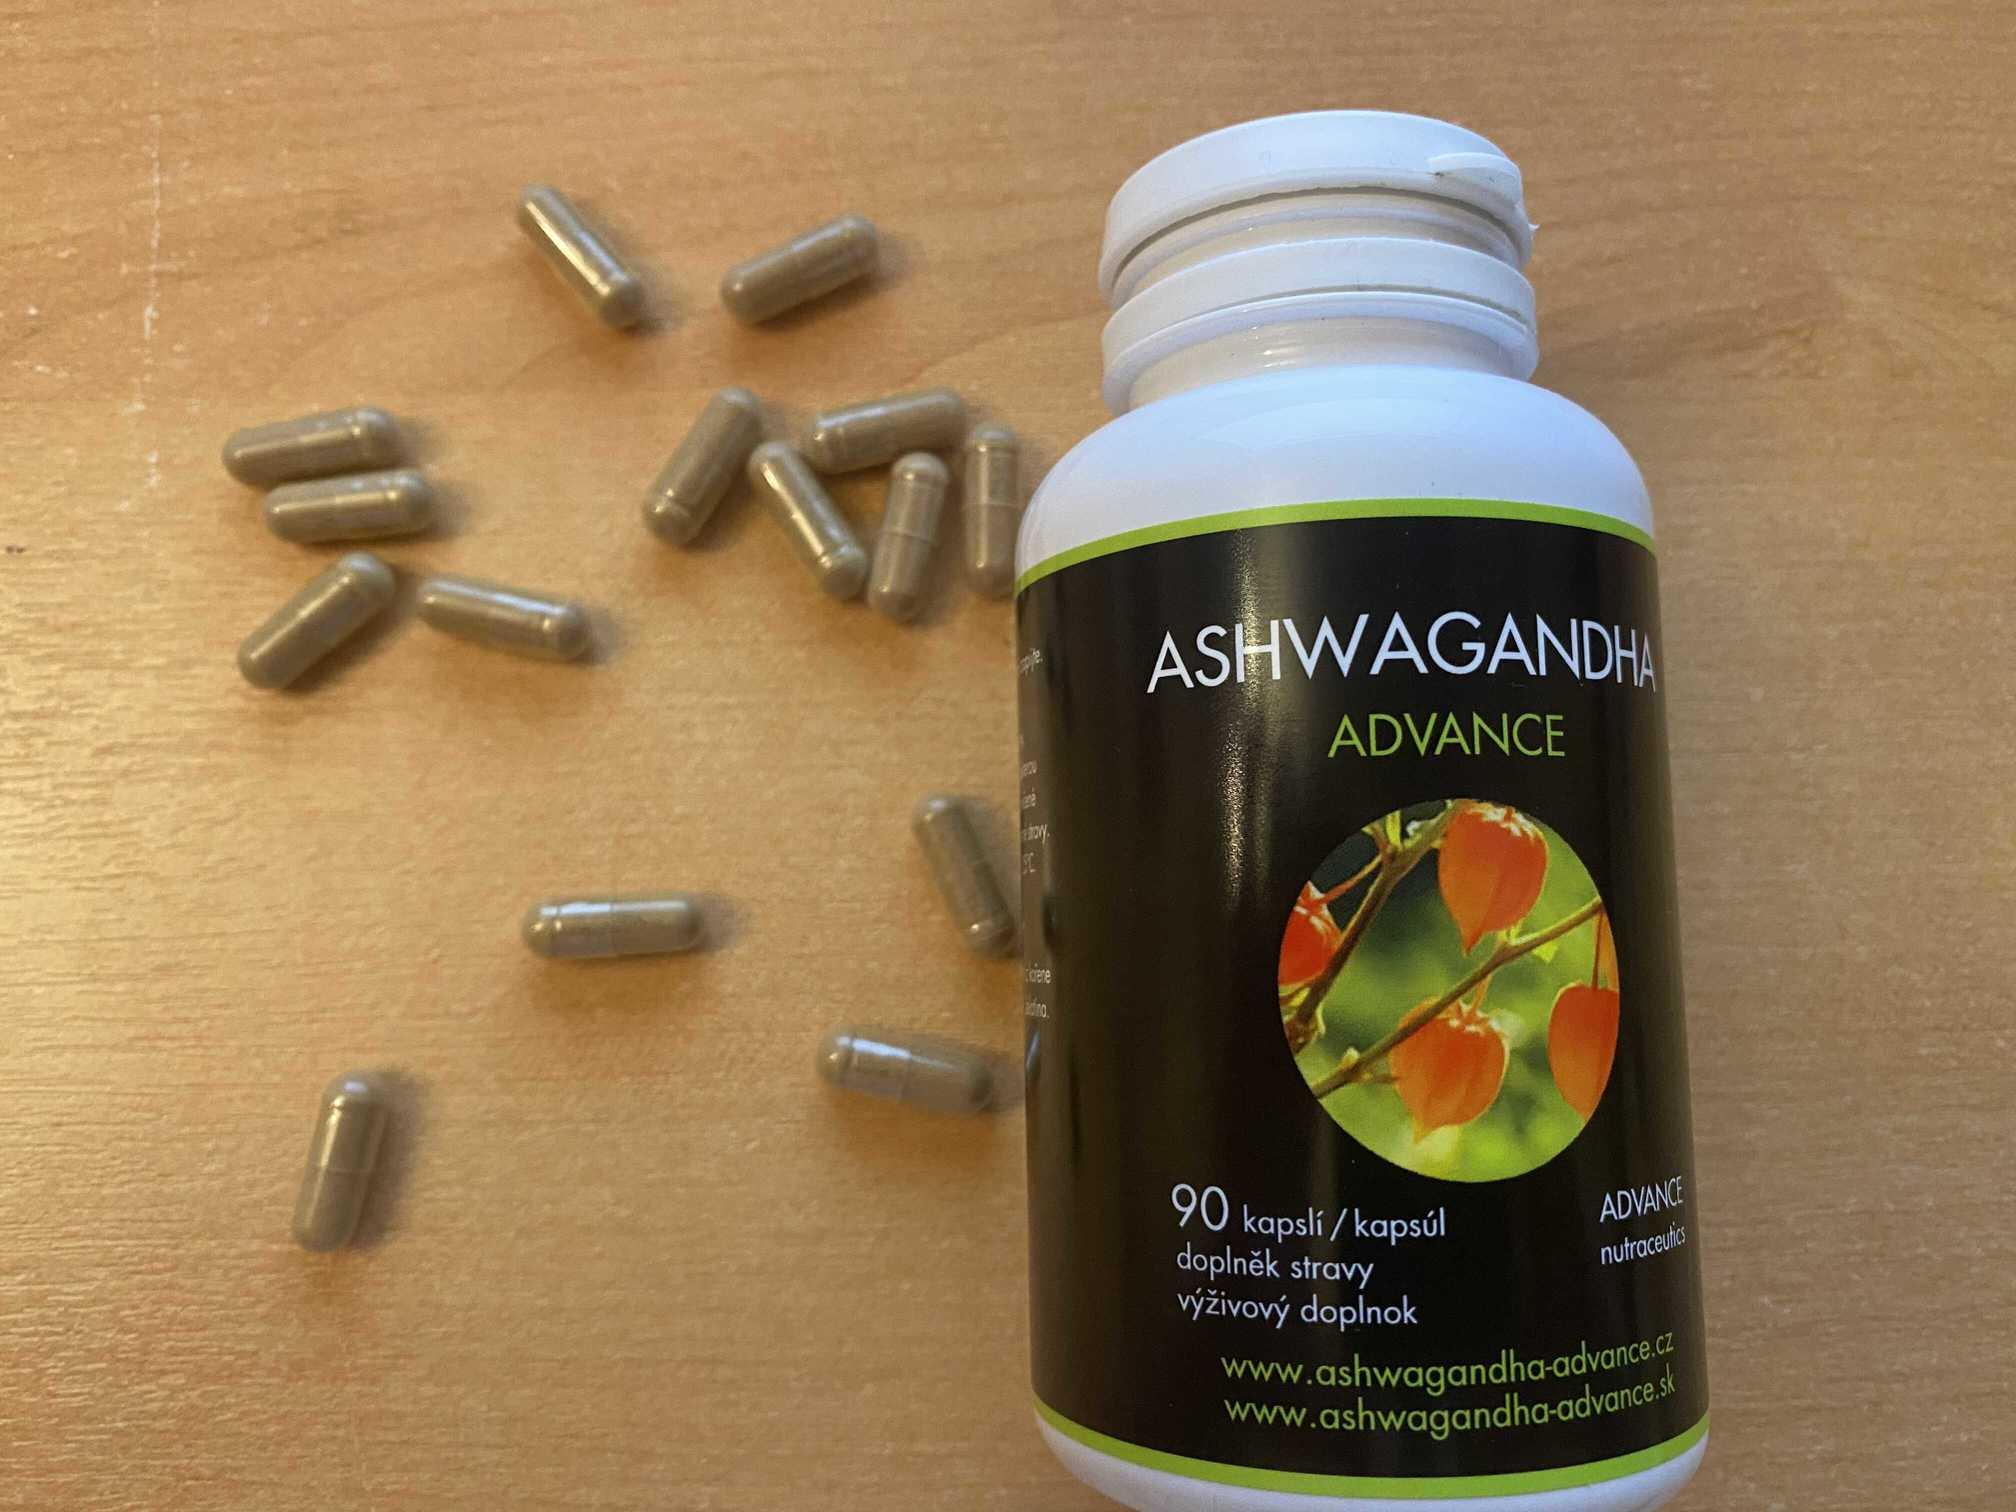 Ashwagandha ADVANCE vysypané kapsle s 5% extraktem